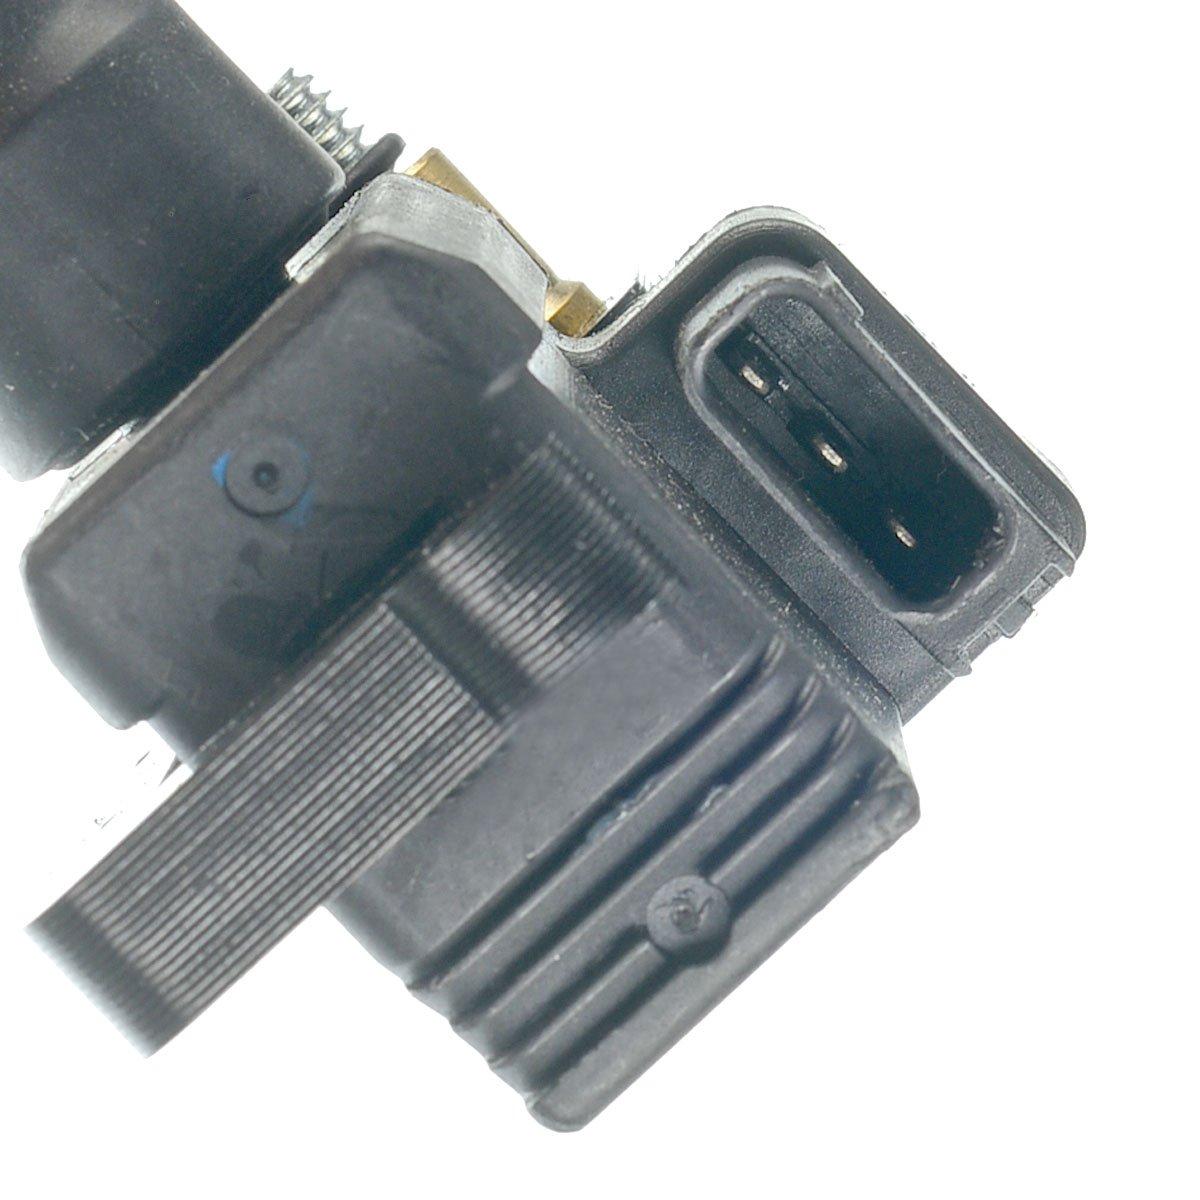 Set of 4 Ignition Coils Pack for Subaru Impreza 2003-2005 Saab 9-2X 2005 I4 2.0L EJ205